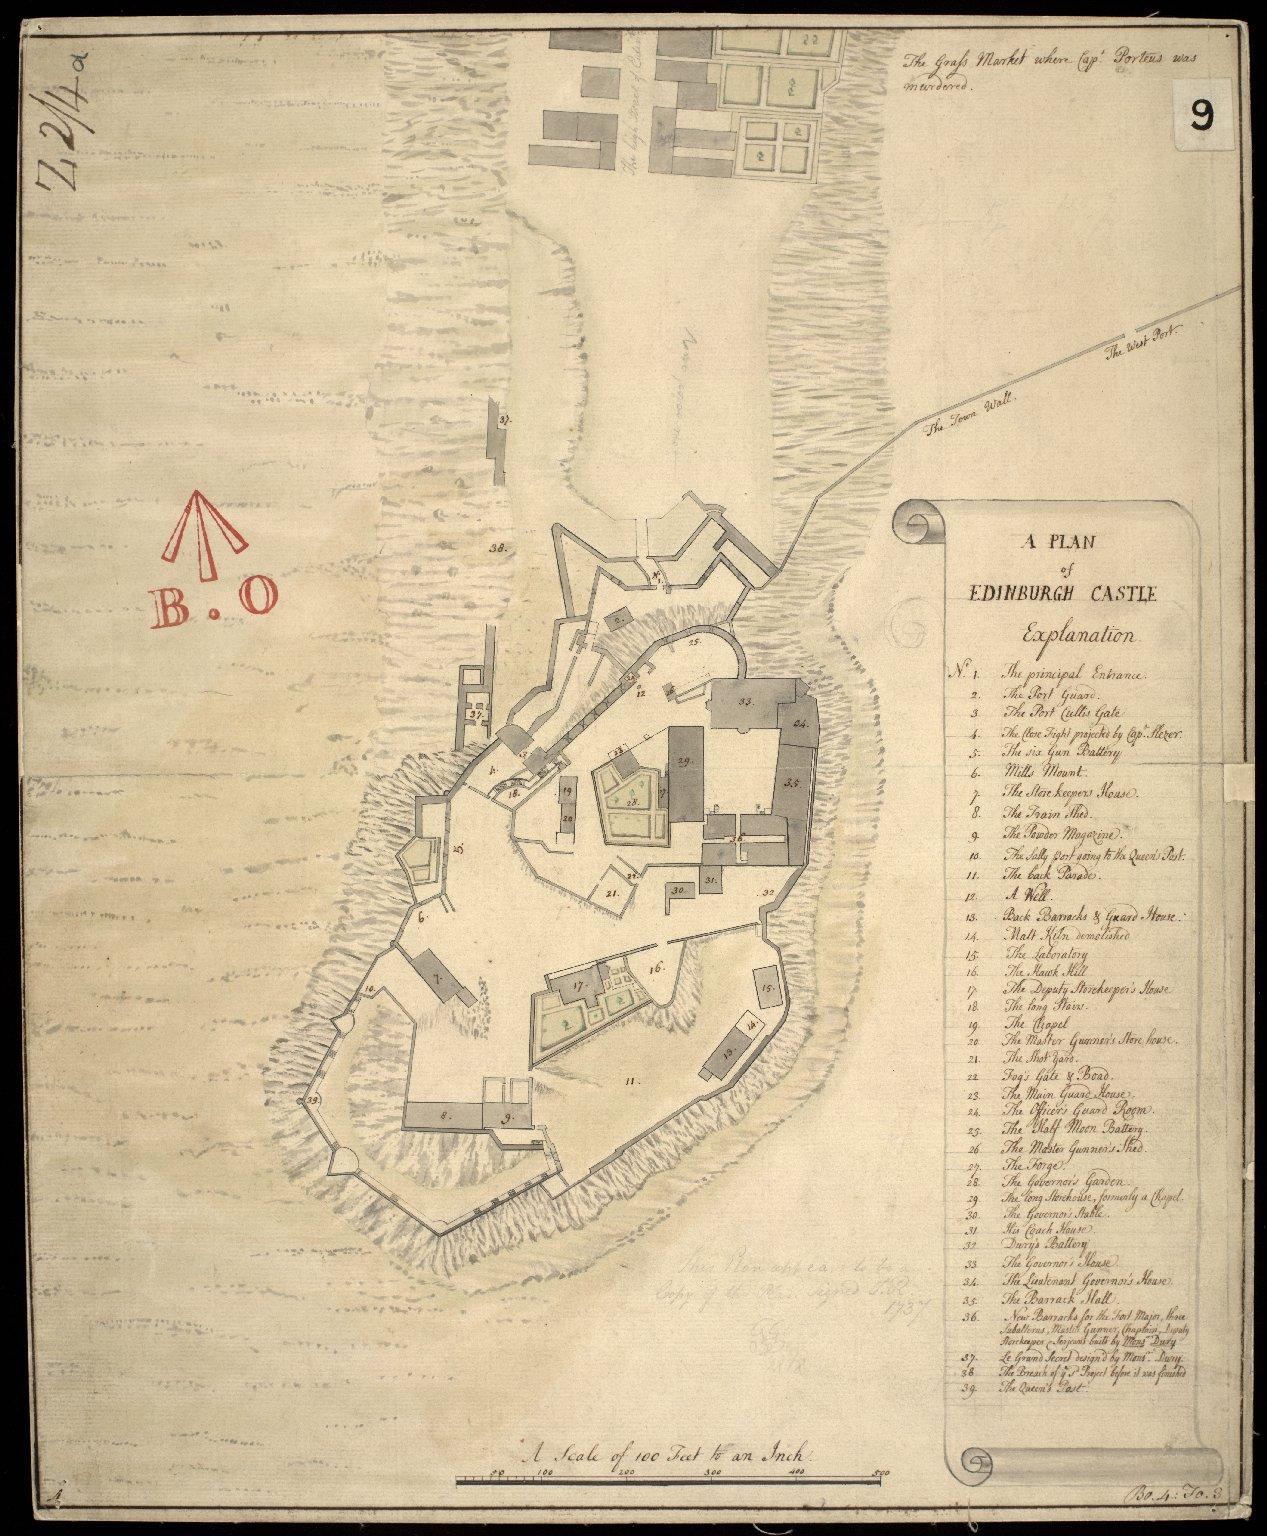 A Plan of Edinburgh Castle [copy] [1 of 1]